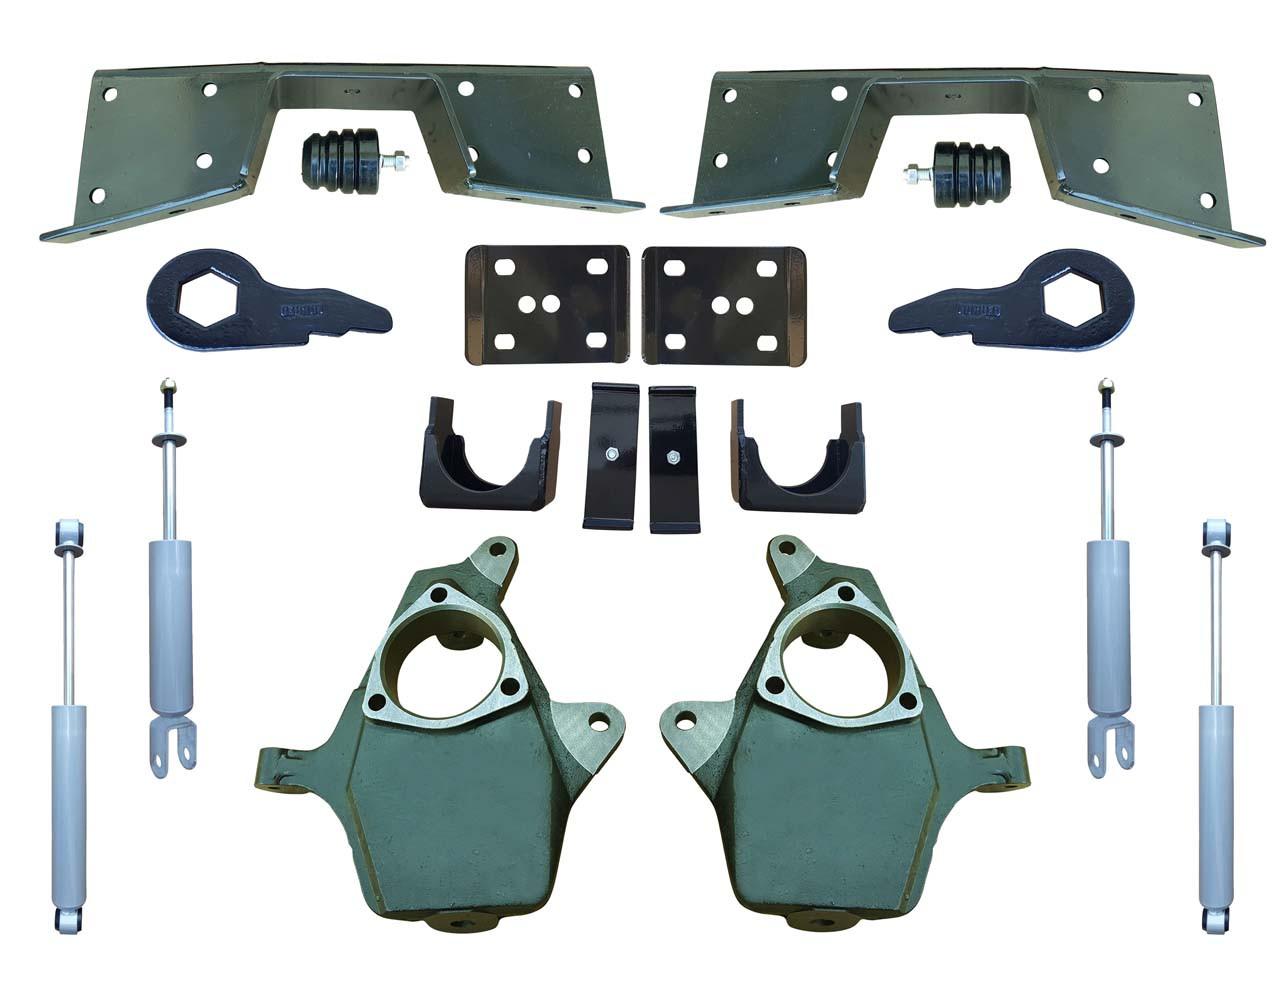 Complete 4/6 Lowering Kit for 99-00 Silverado / Sierra 4WD